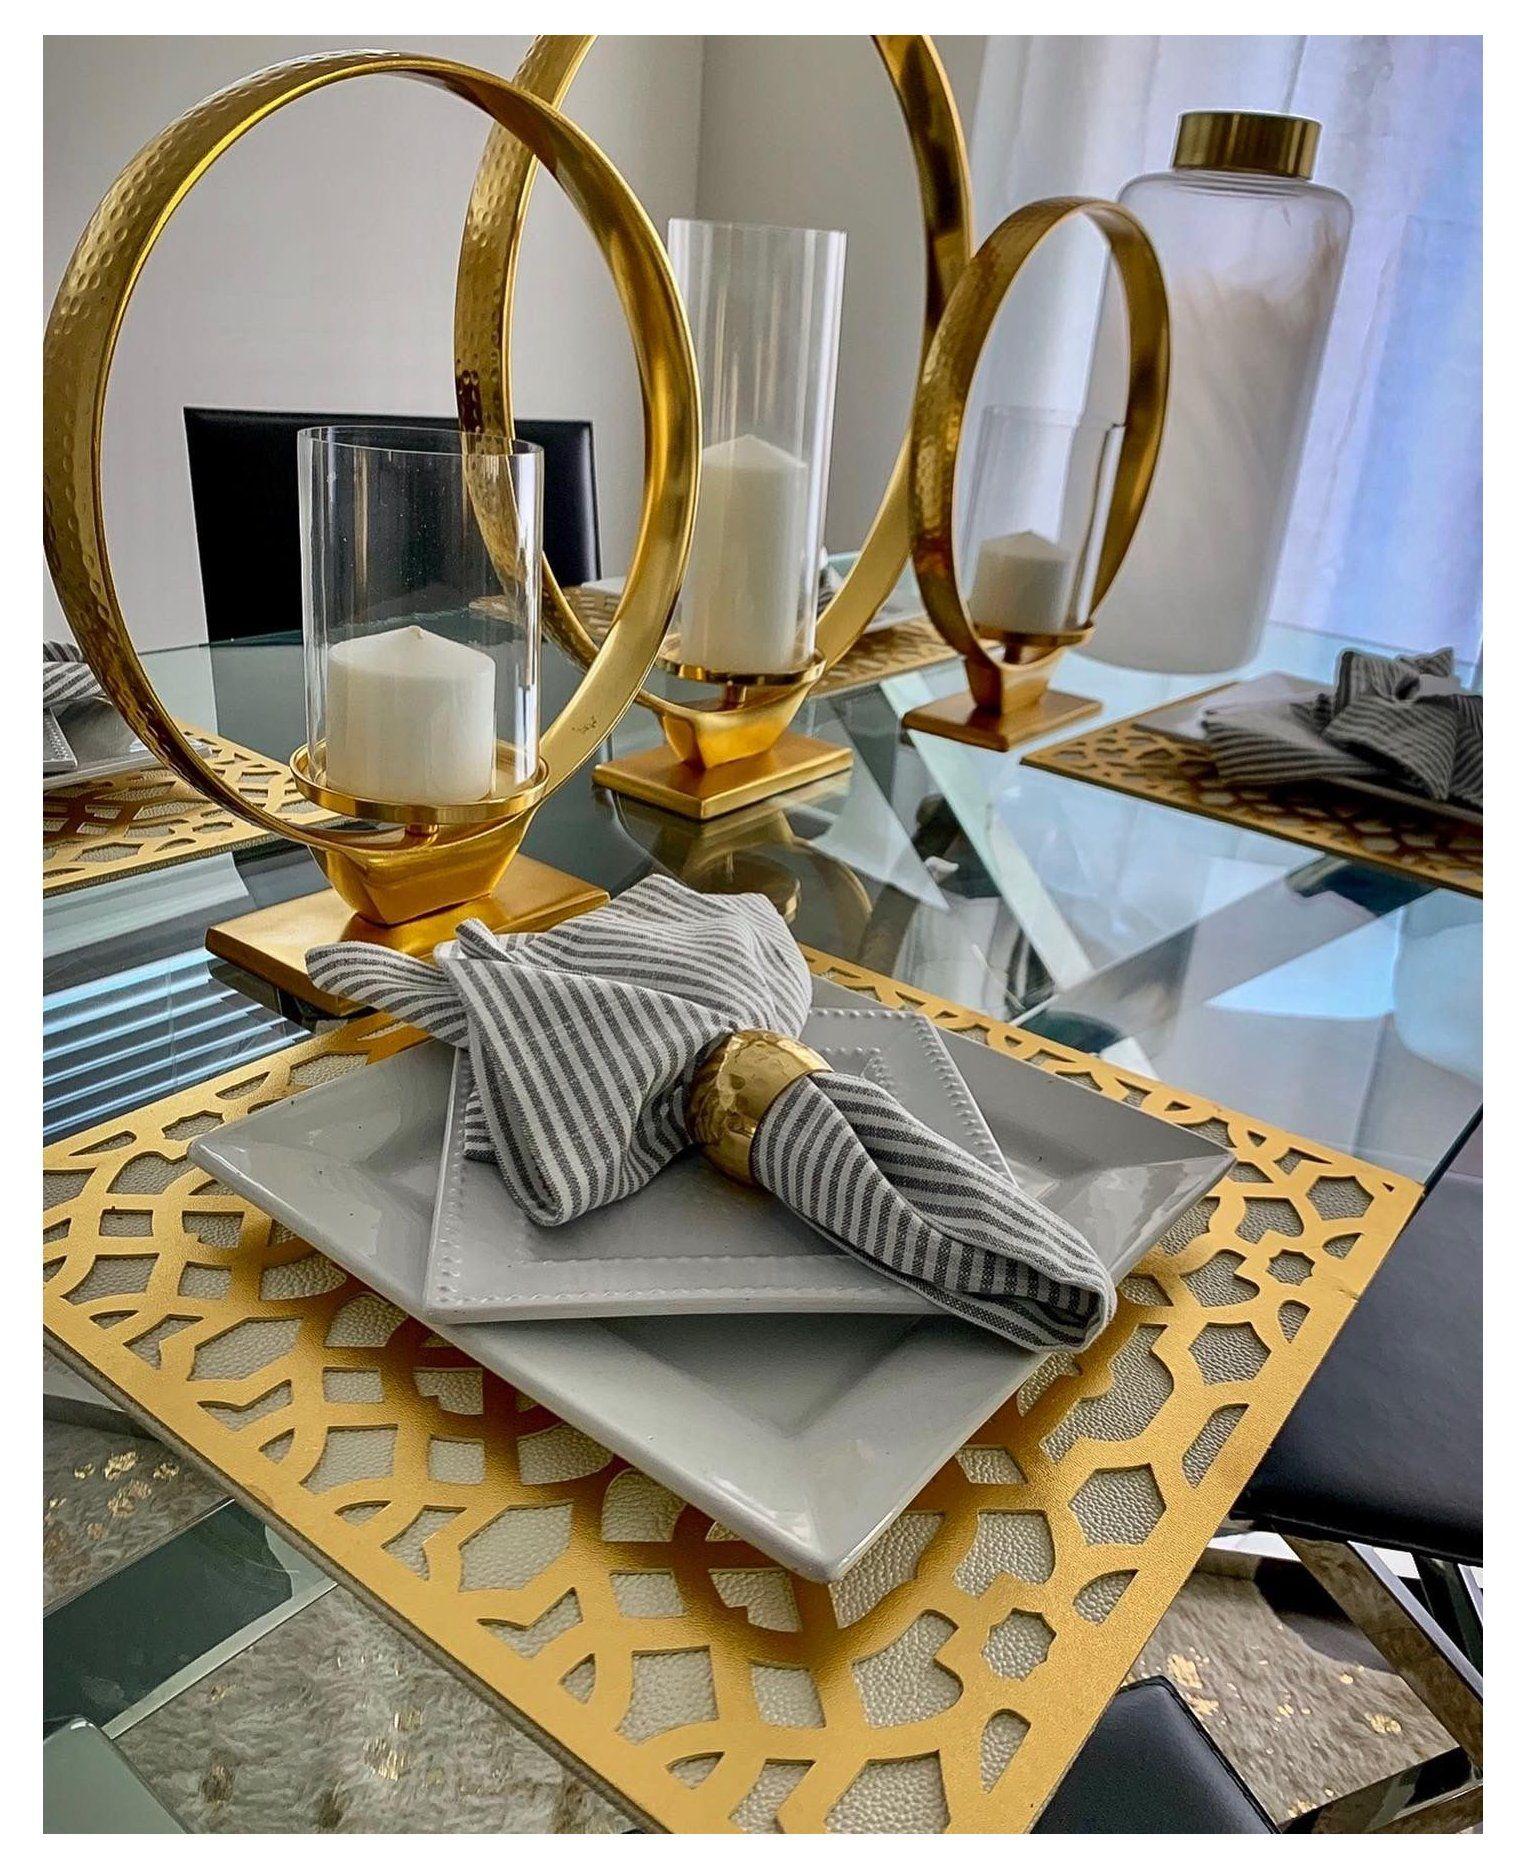 Glam Gold Decor Gold Dining Table Decor Golddiningtabledecor I Love My Dining Room Table In 2021 Dining Room Table Decor Gold Dining Room Table Dining Table Decor